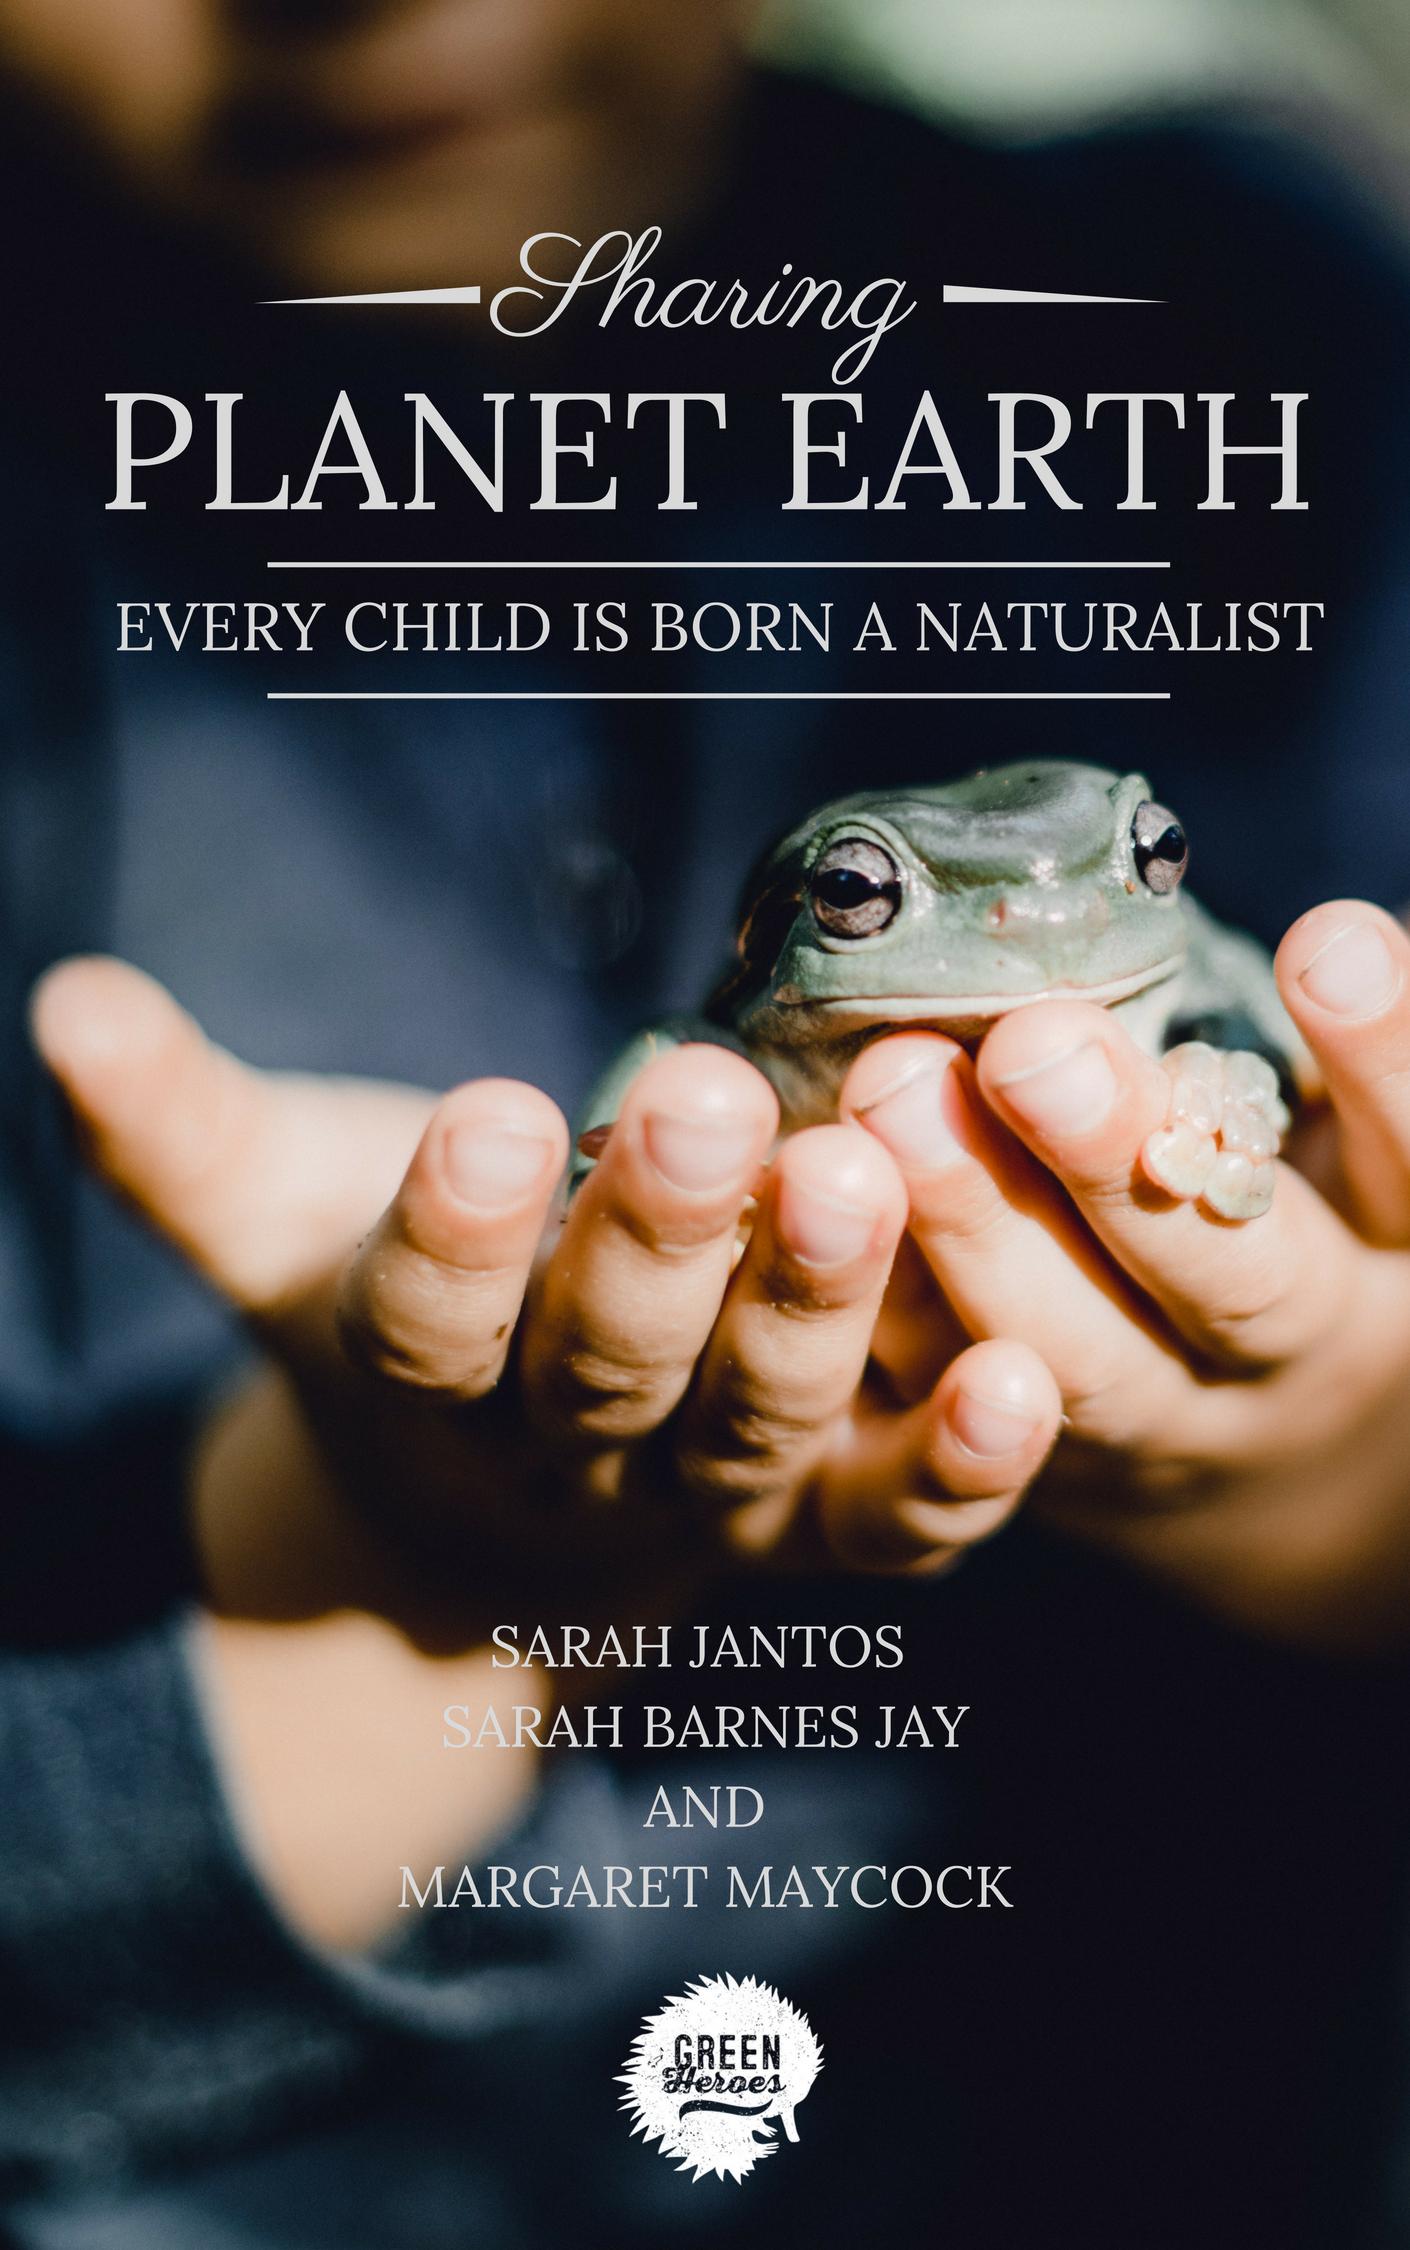 Planet Earth part 1.jpg